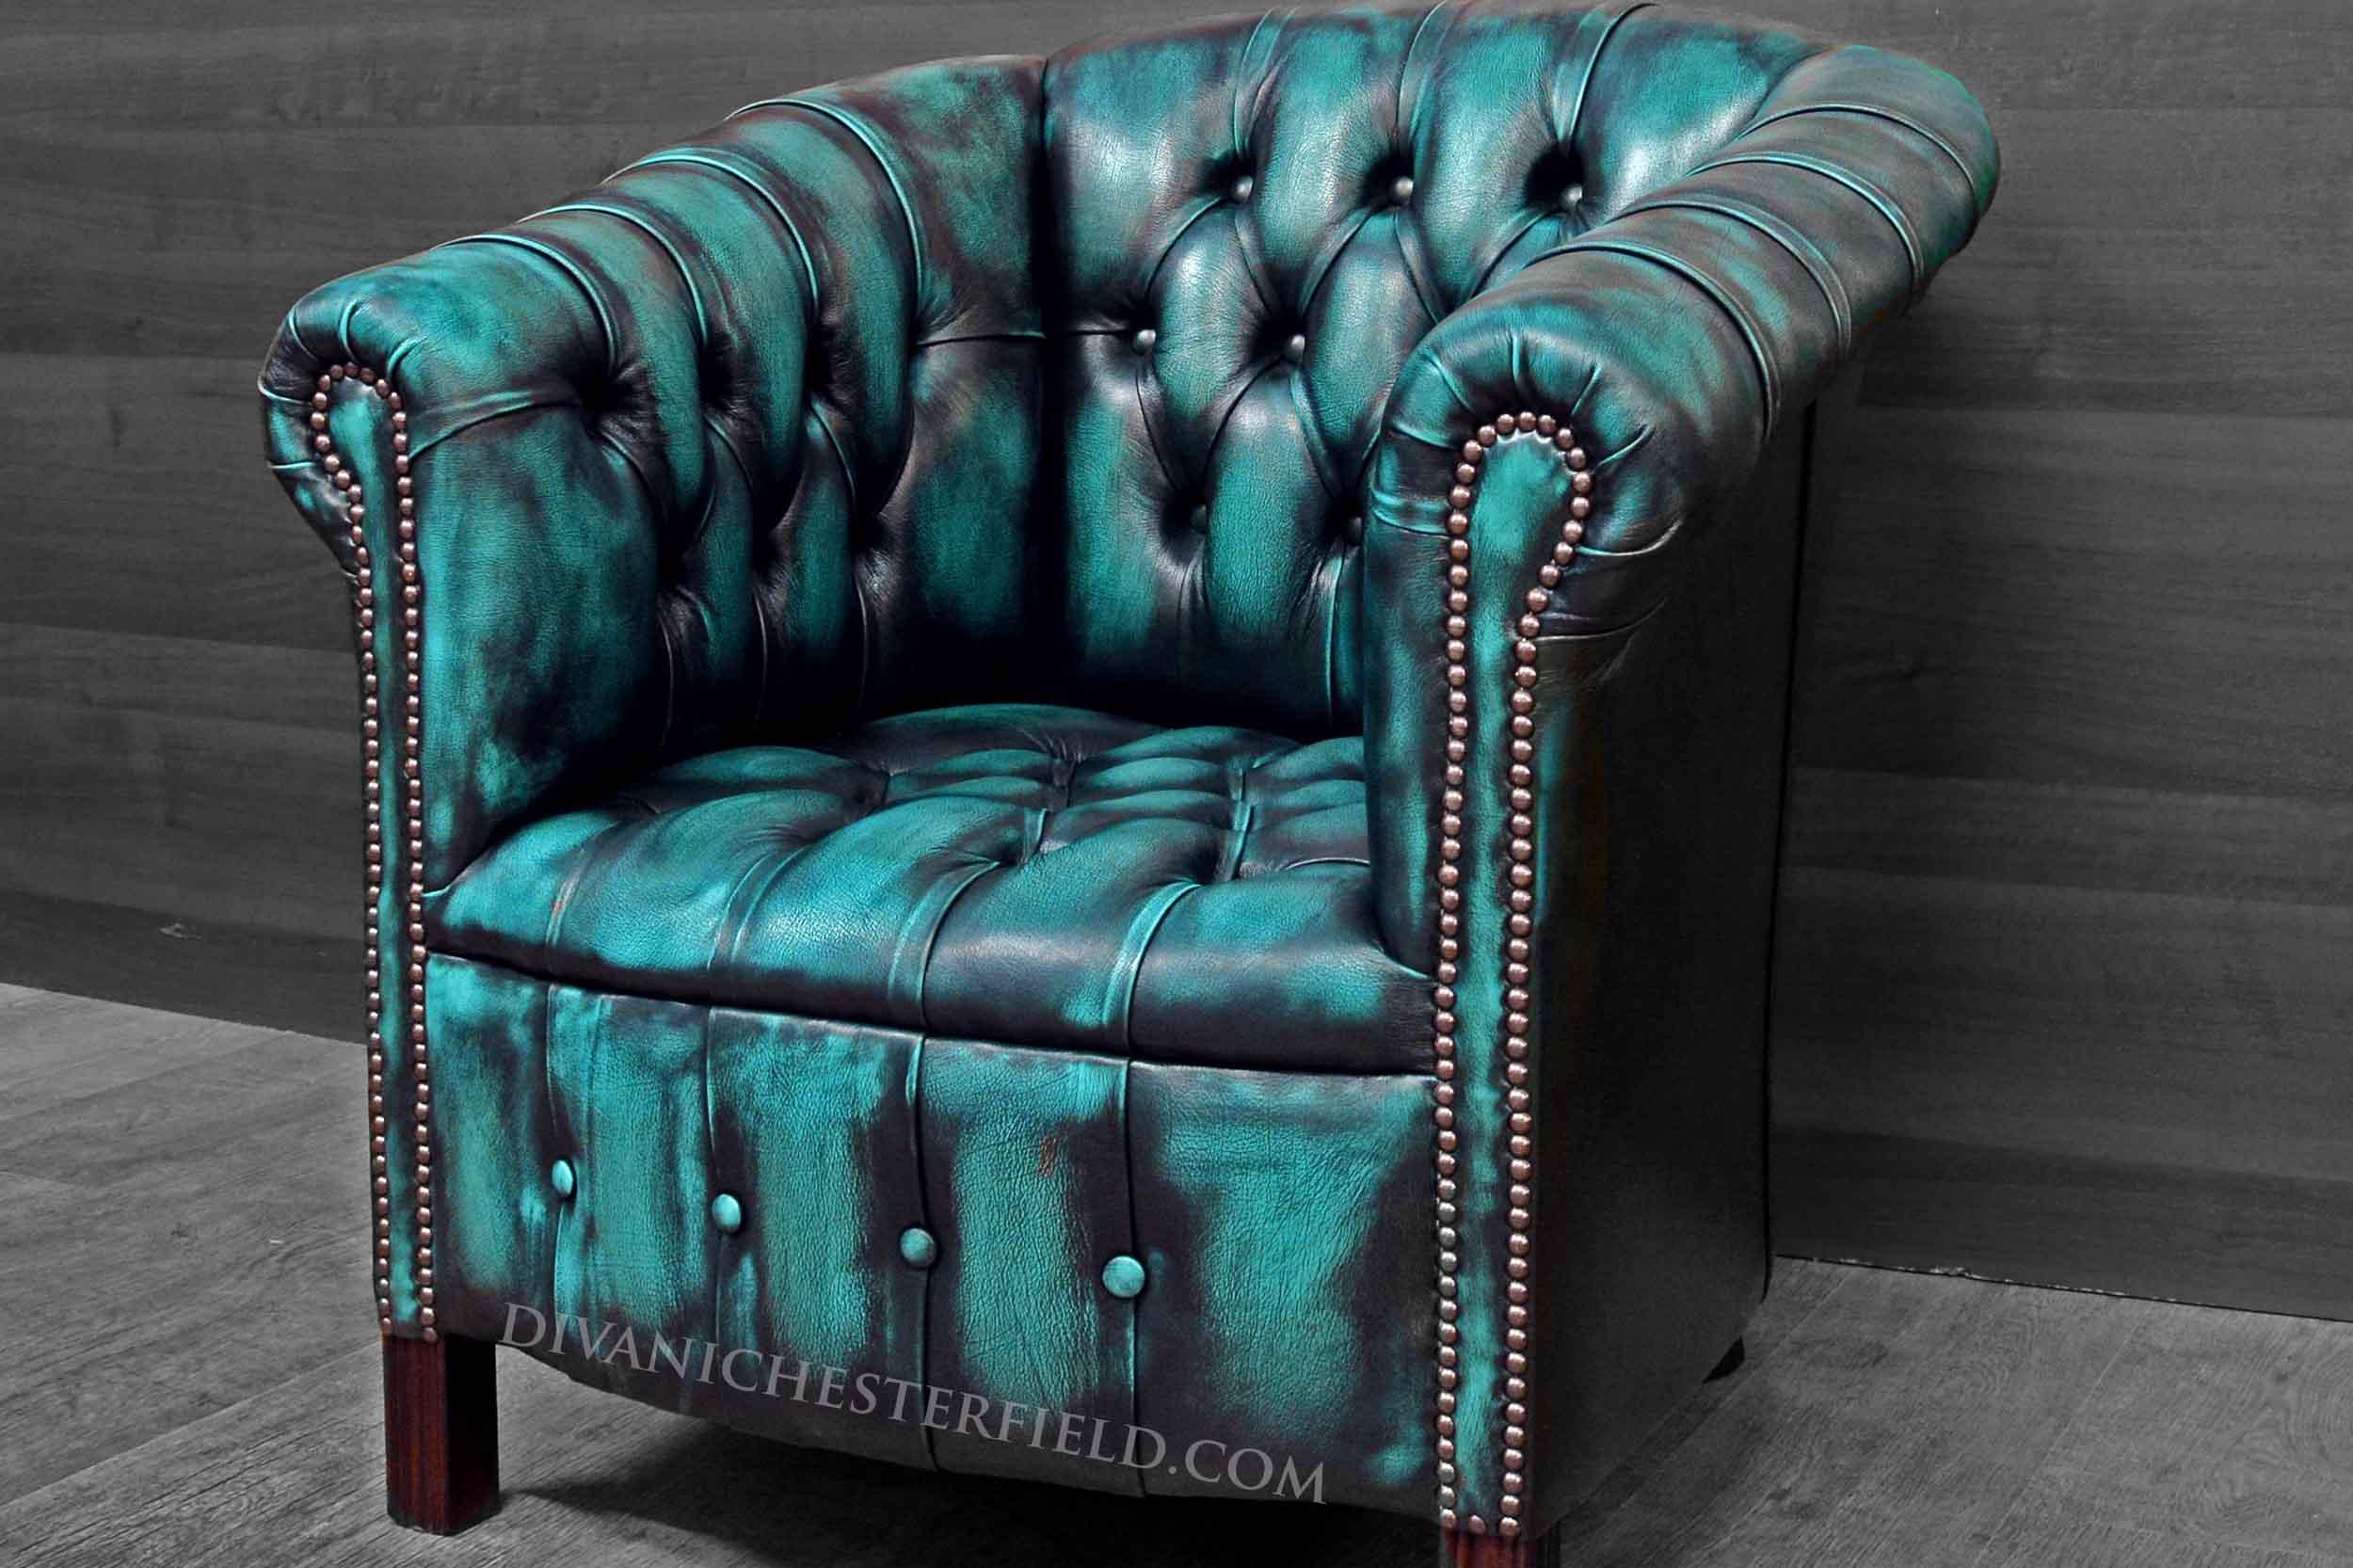 Poltrona chesterfield vintage pelle celeste turchese nuova for Poltrone vintage pelle